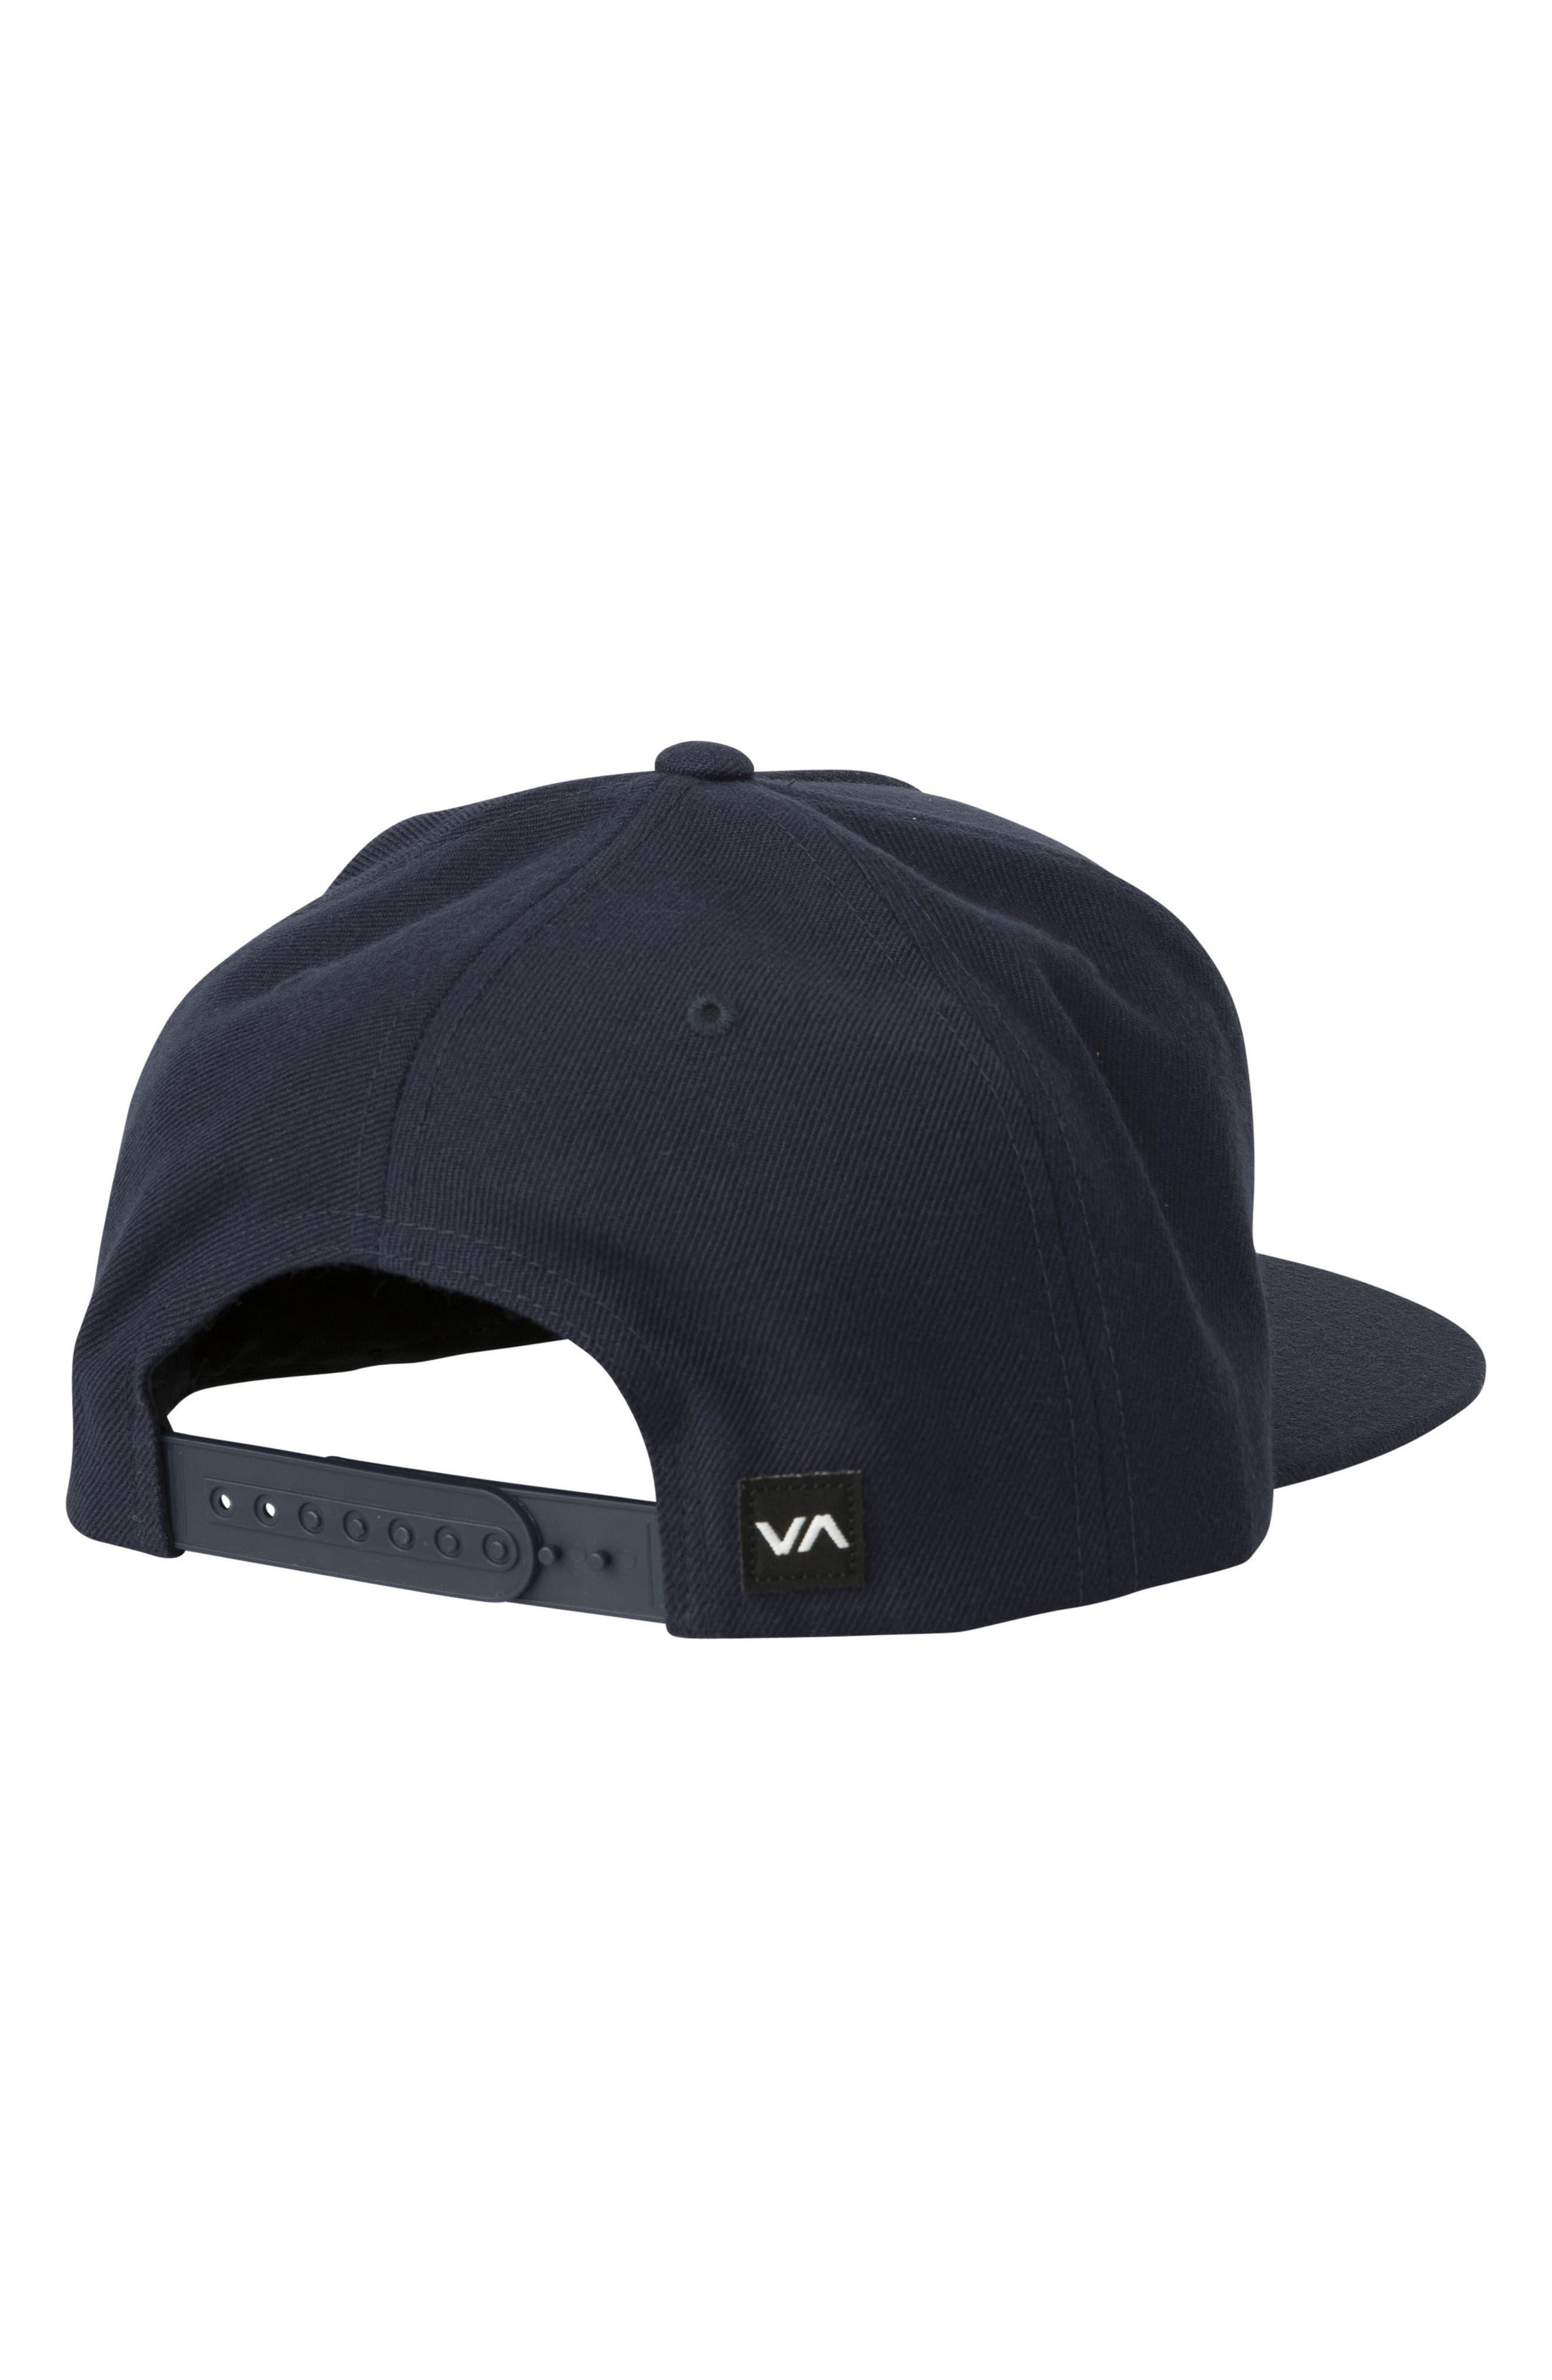 Commonwealth Snapback Baseball Cap,                             Alternate thumbnail 2, color,                             Black/ White